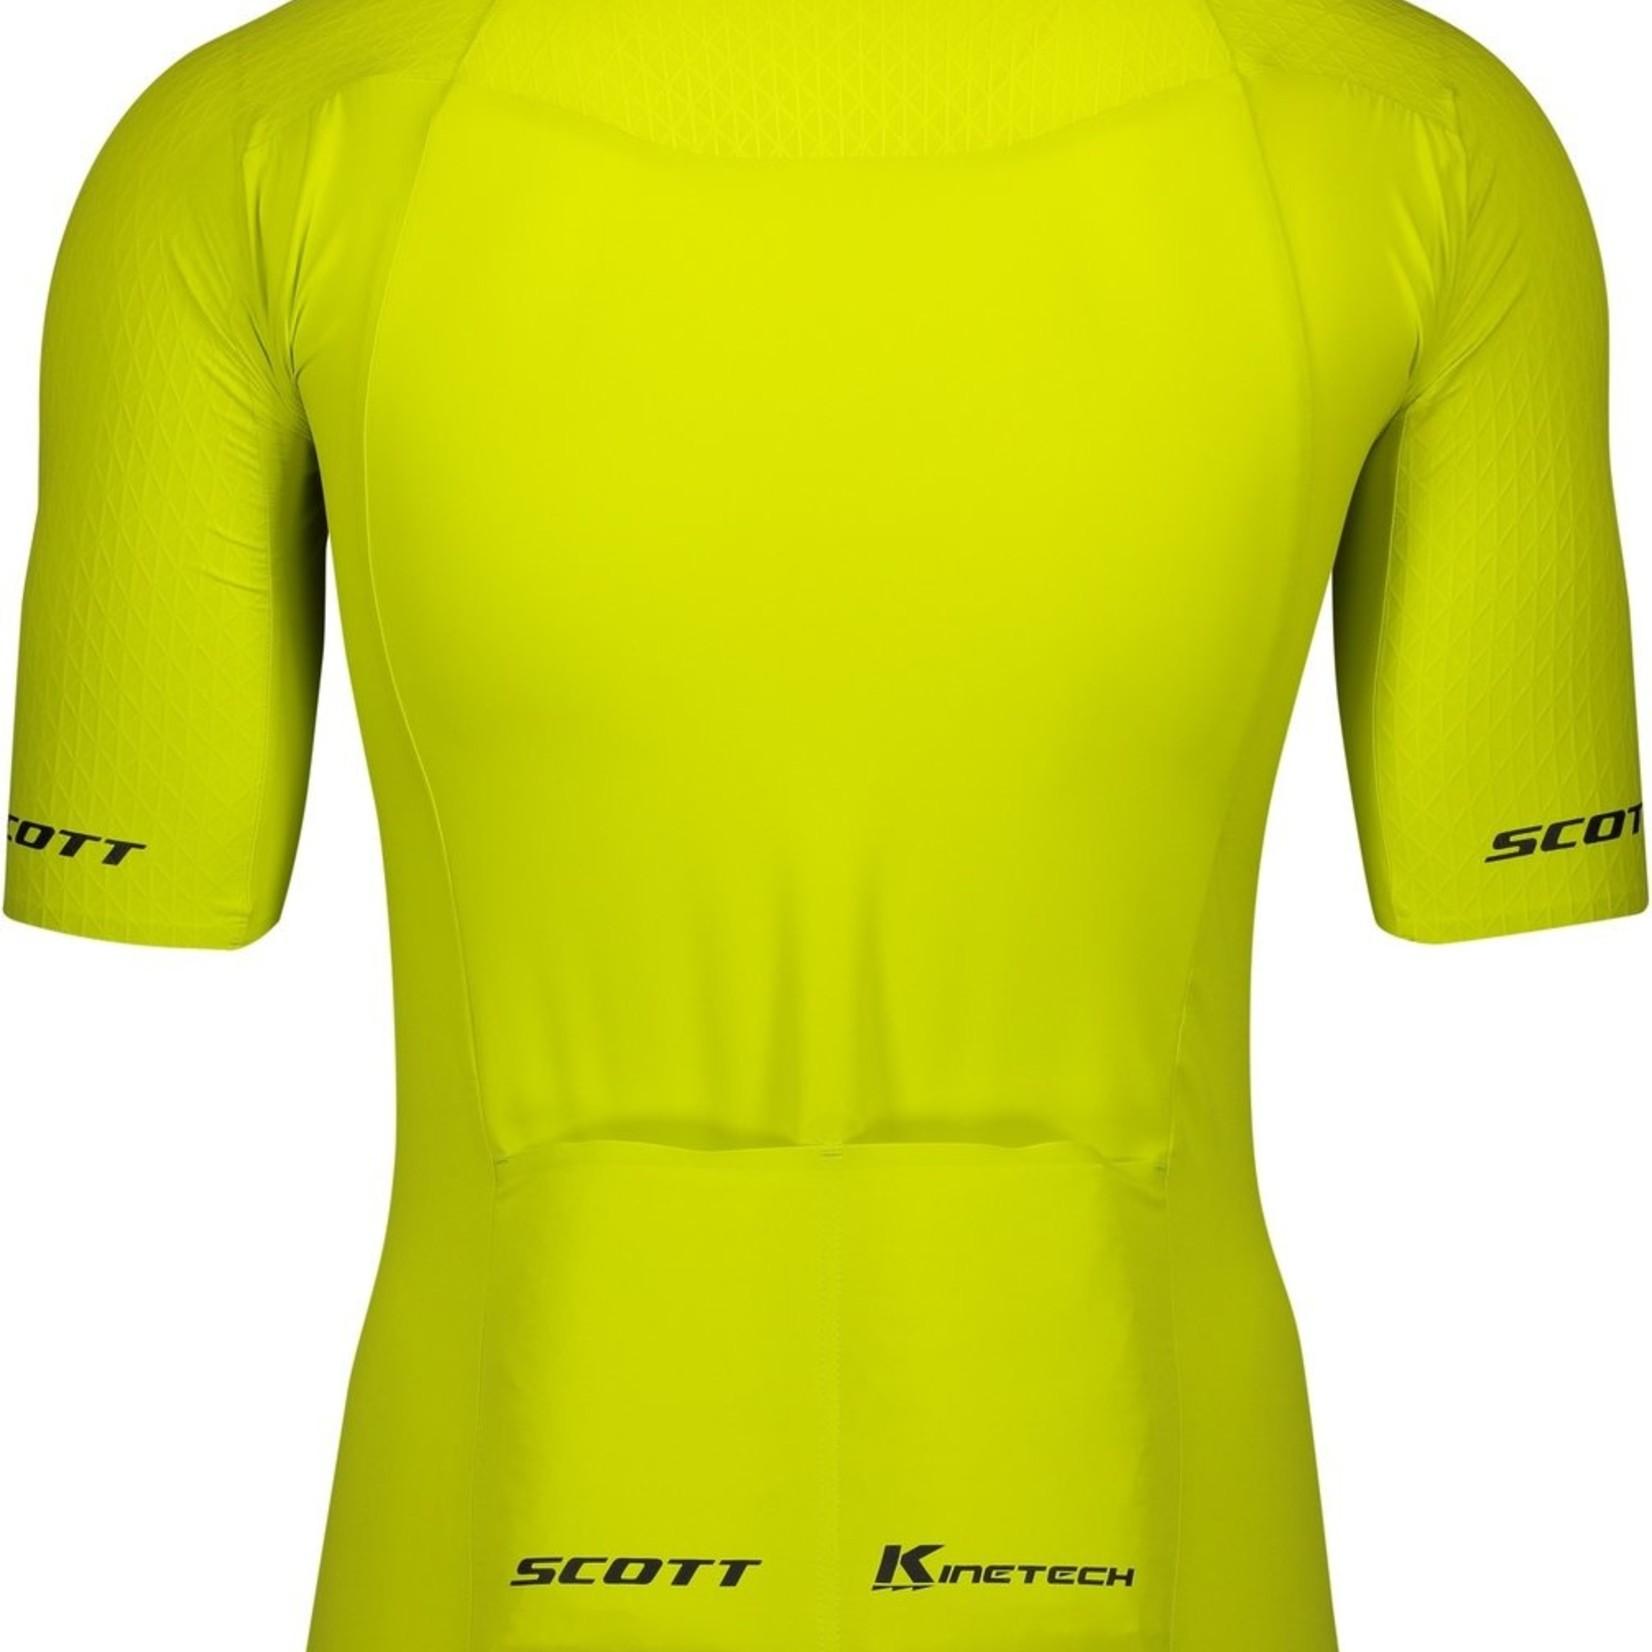 Scott SCOTT RC PREMIUM KINETECH S/SL MEN'S SHIRT Yellow